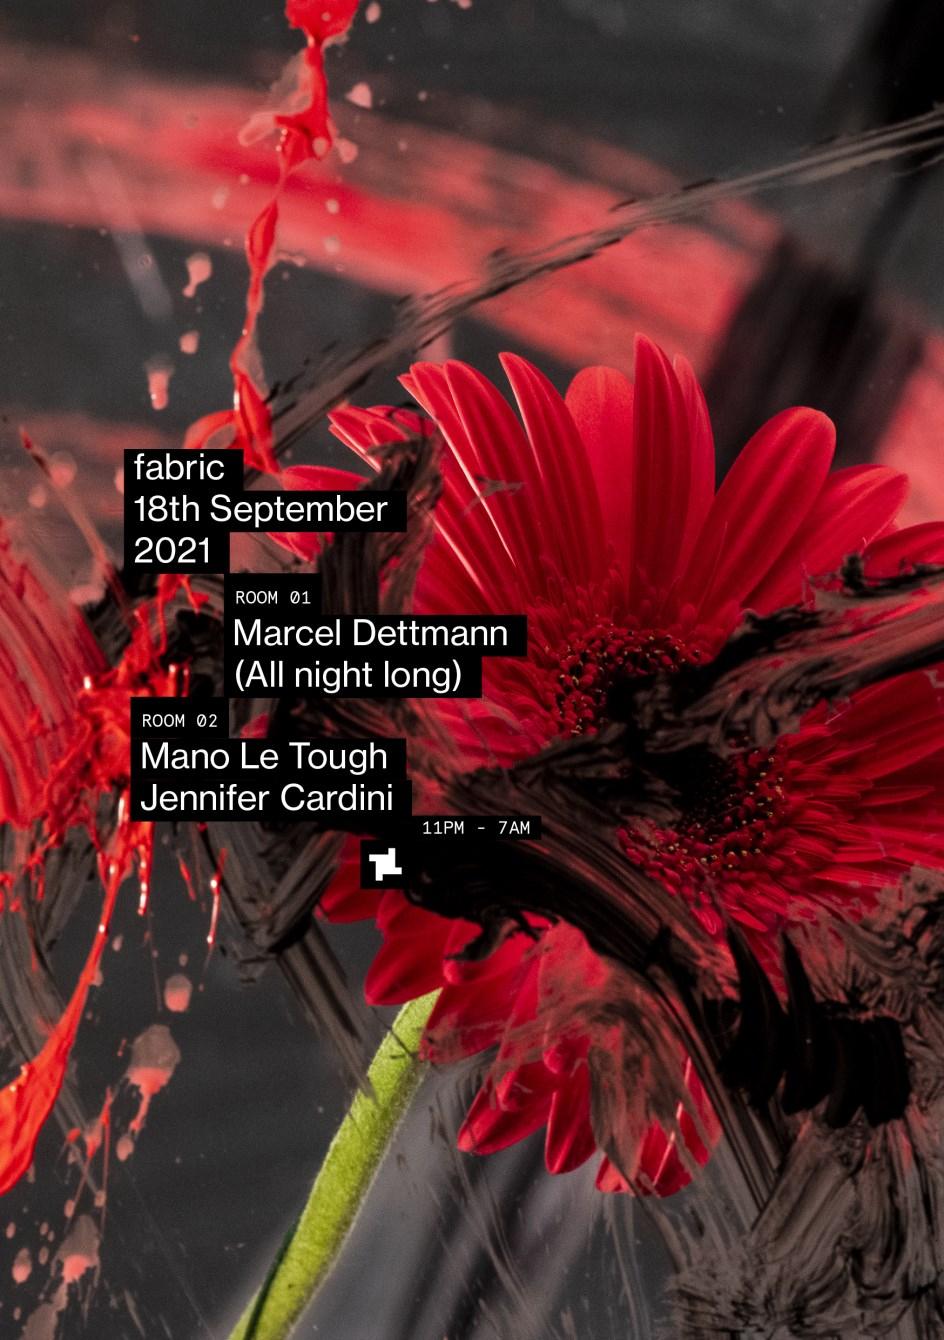 fabric: Marcel Dettmann (All Night Long), Mano Le Tough, Jennifer Cardini - Flyer front